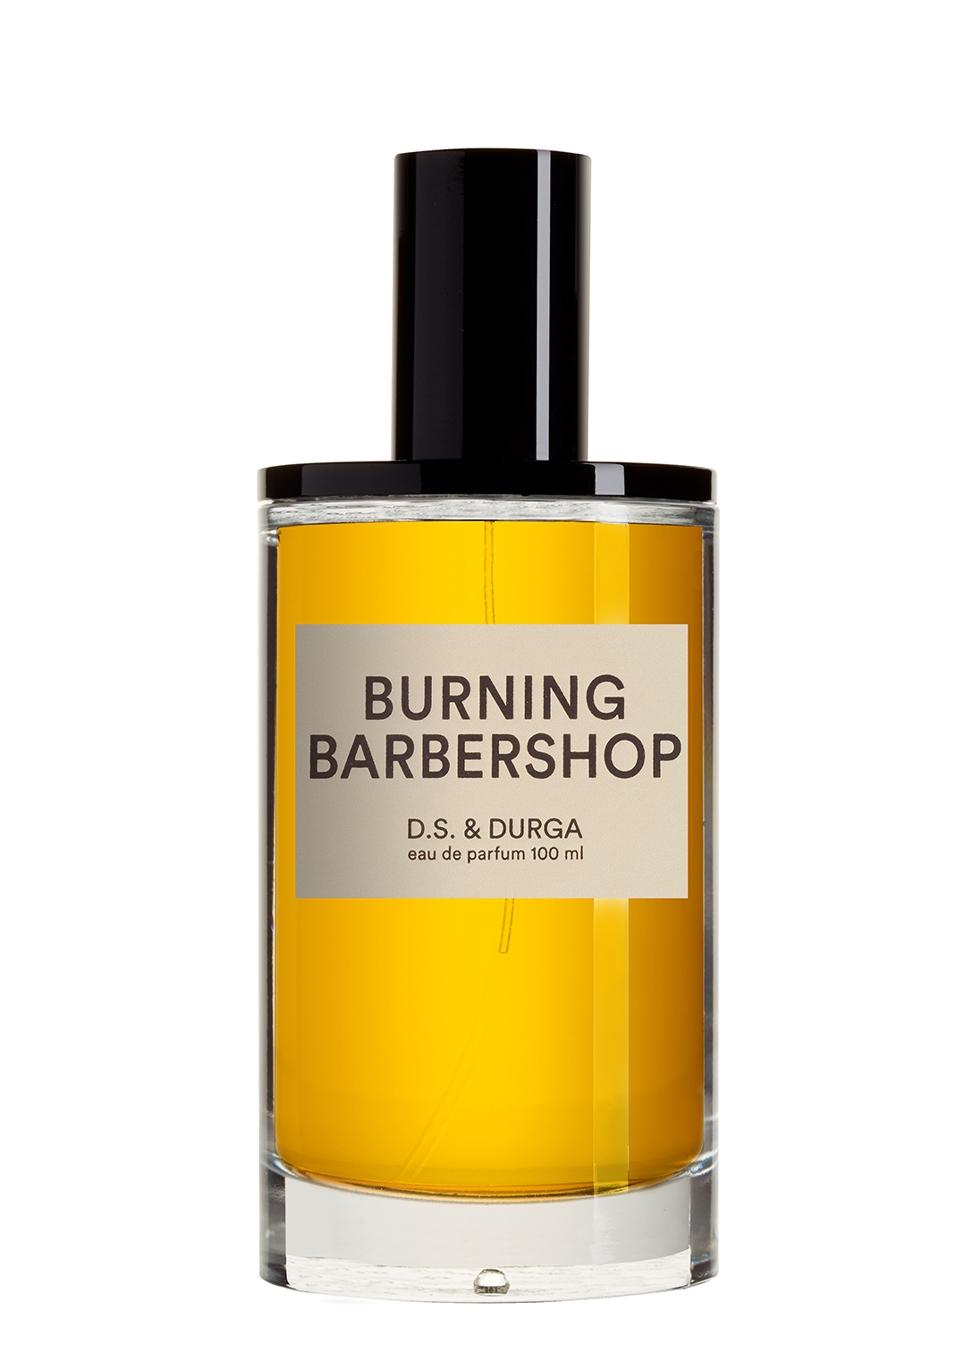 Burning Barbershop Eau De Parfum 100ml